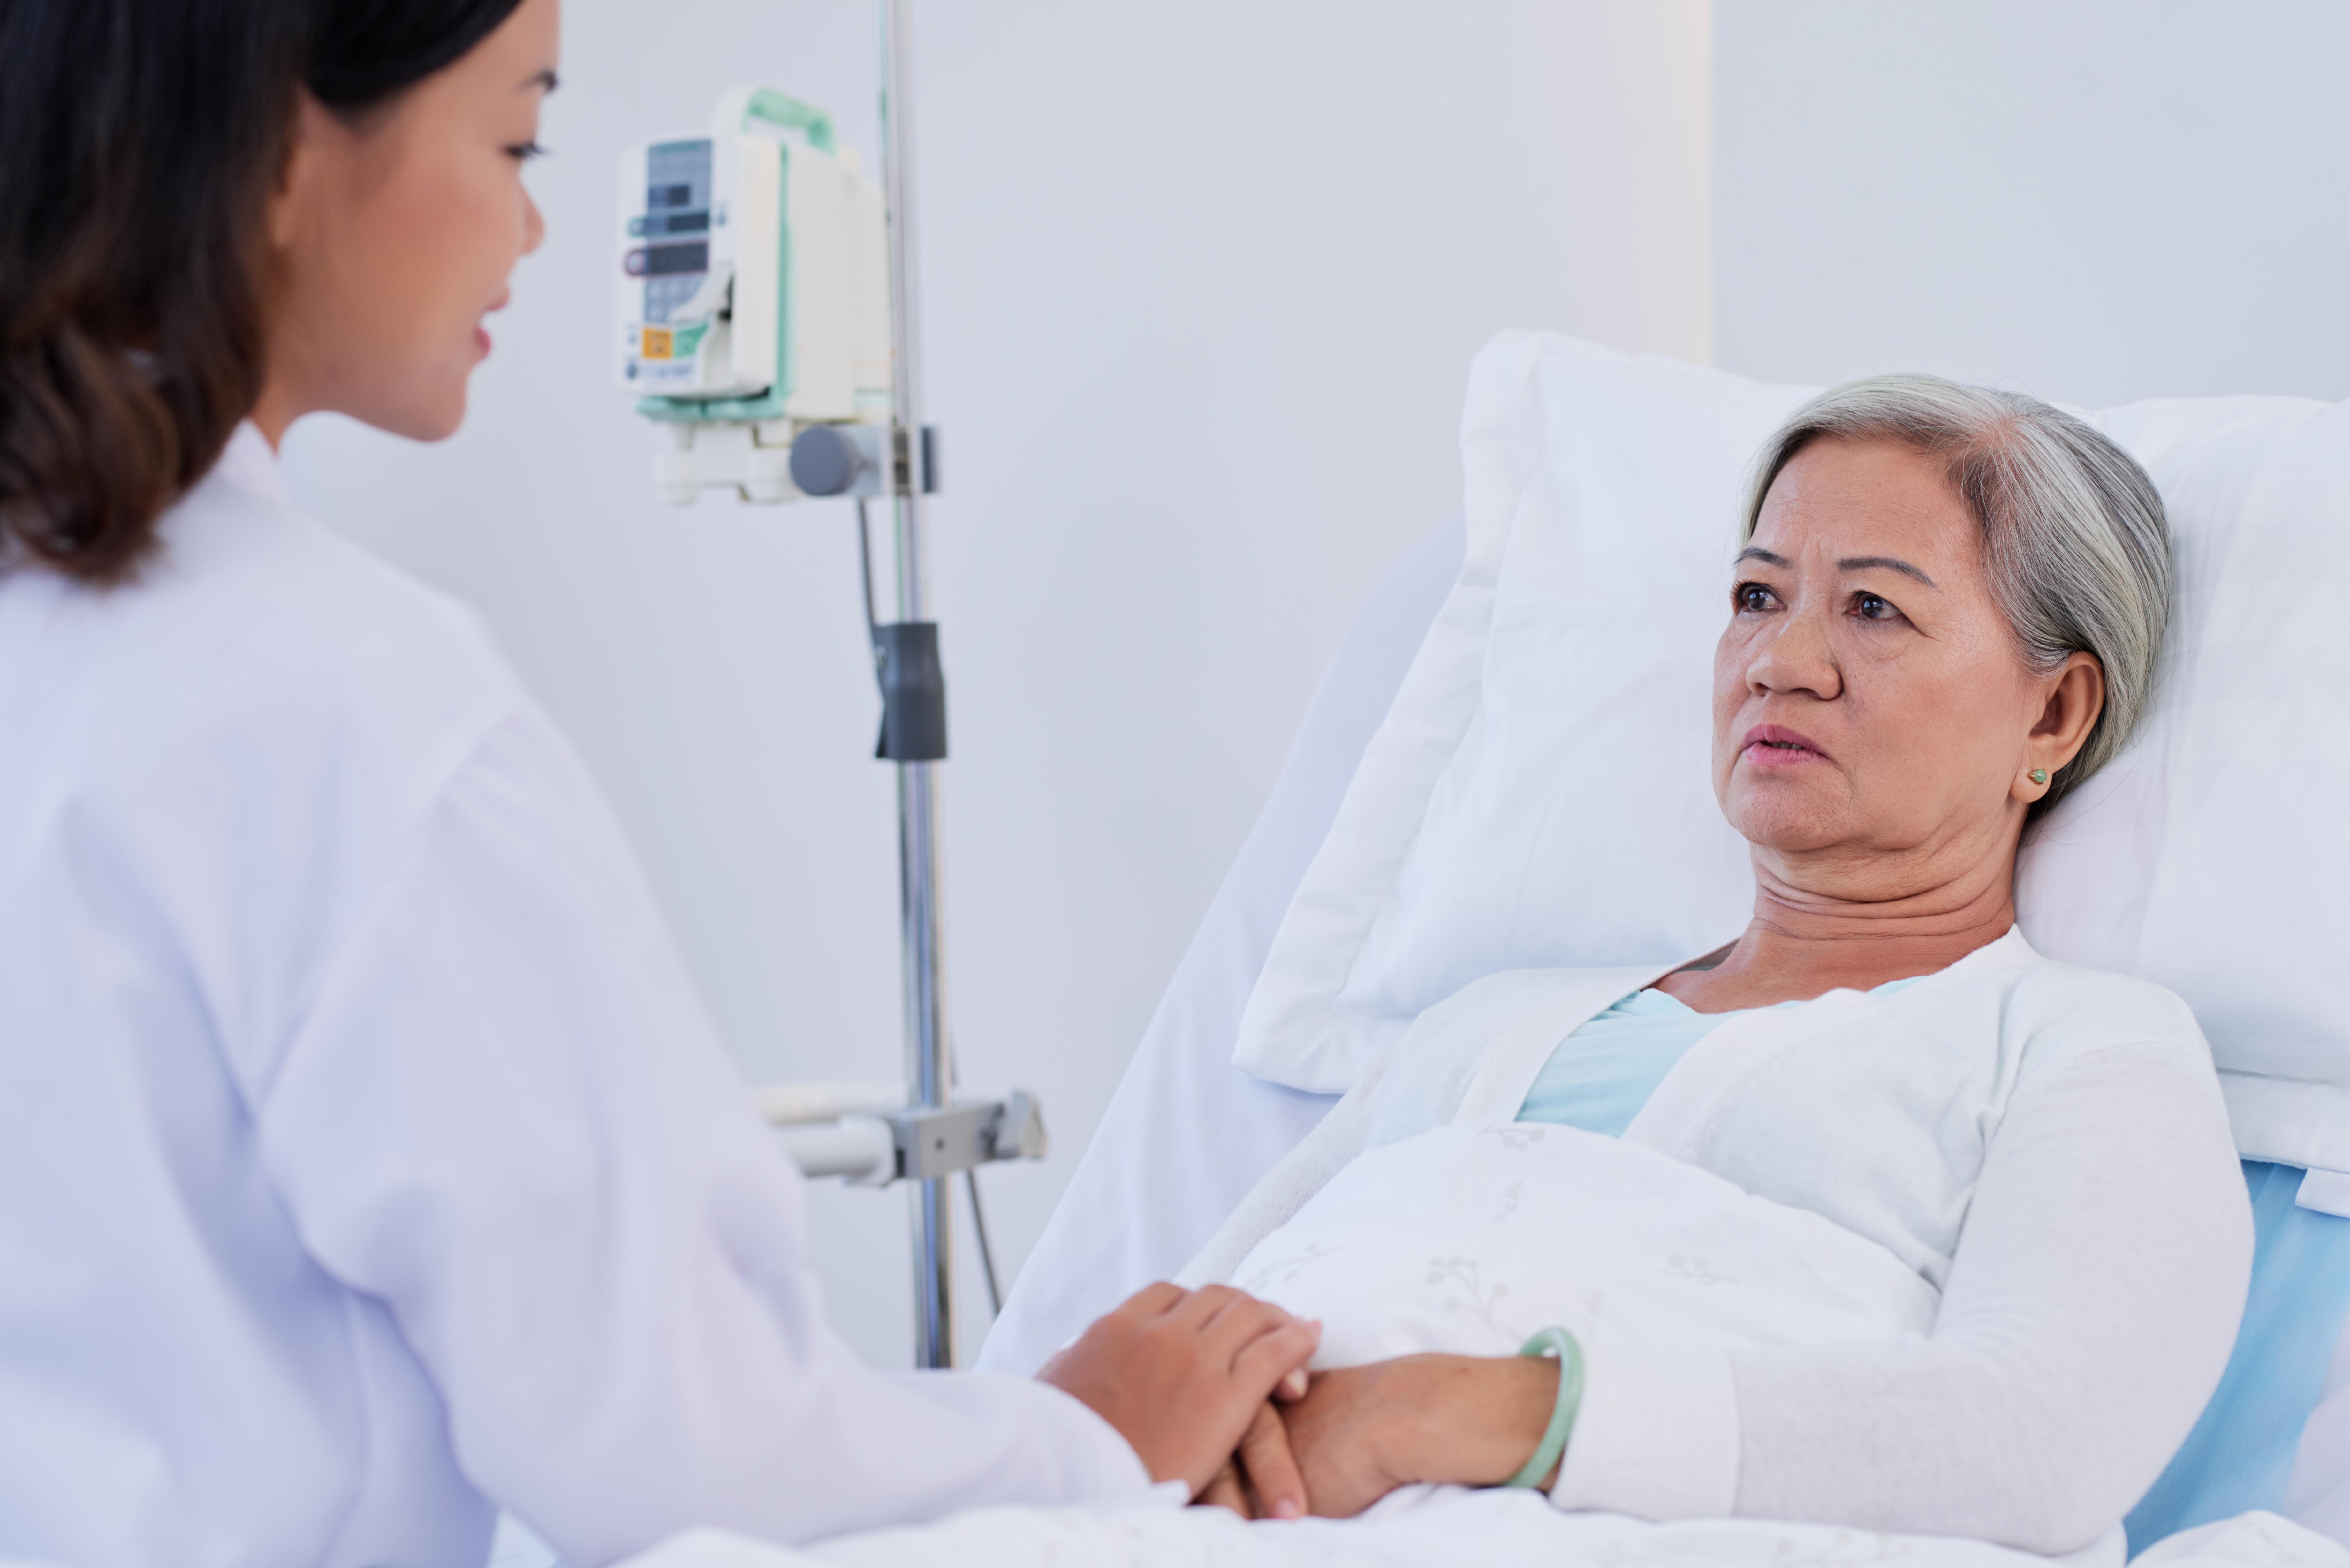 Krankenpflegerin hält Hand einer Seniorin am Spitalbett